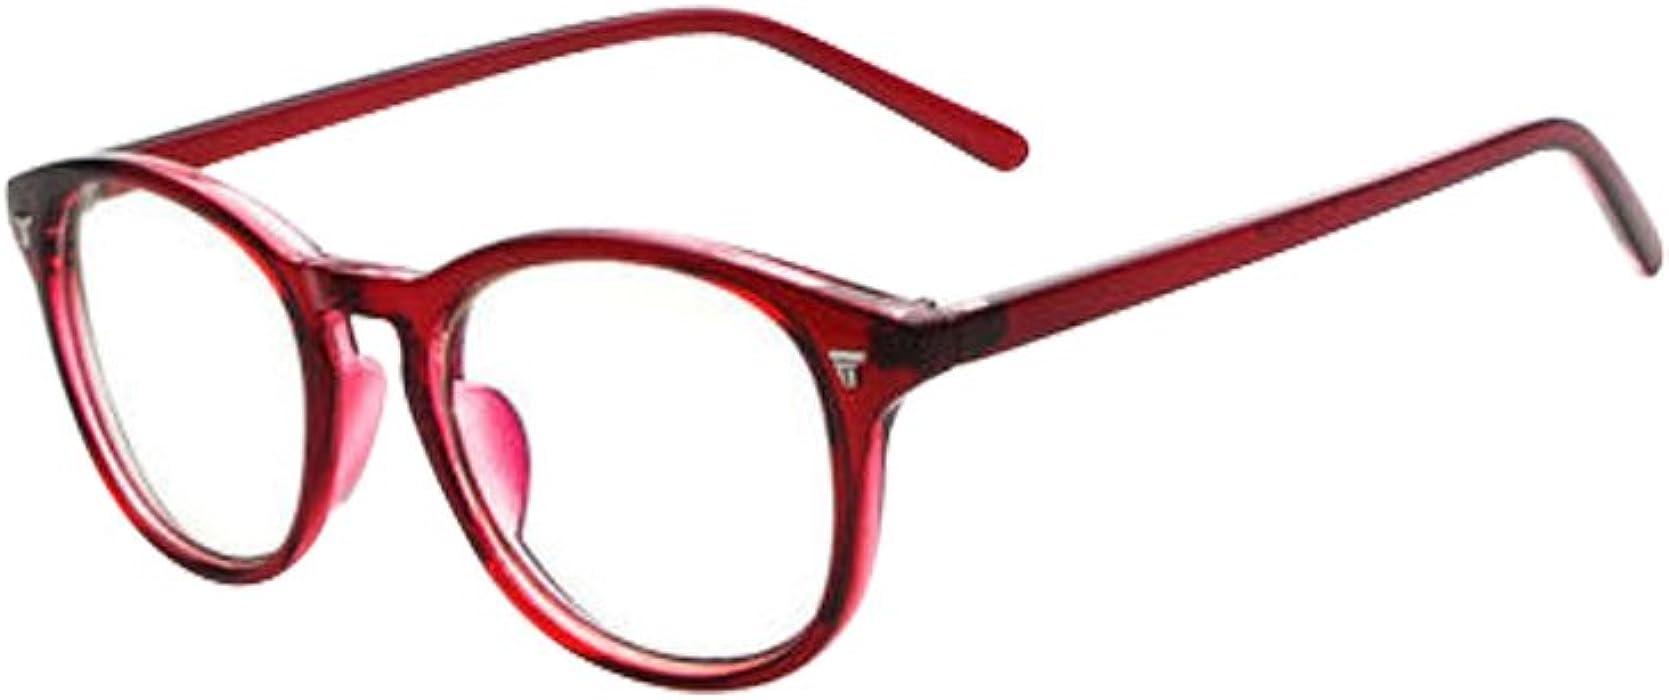 45c720e3c2 Amazon.com  Wine Red Vintage Men Women Eyeglass Frame Glasses Retro  Spectacles Clear Lens Eyewear Rx  Clothing